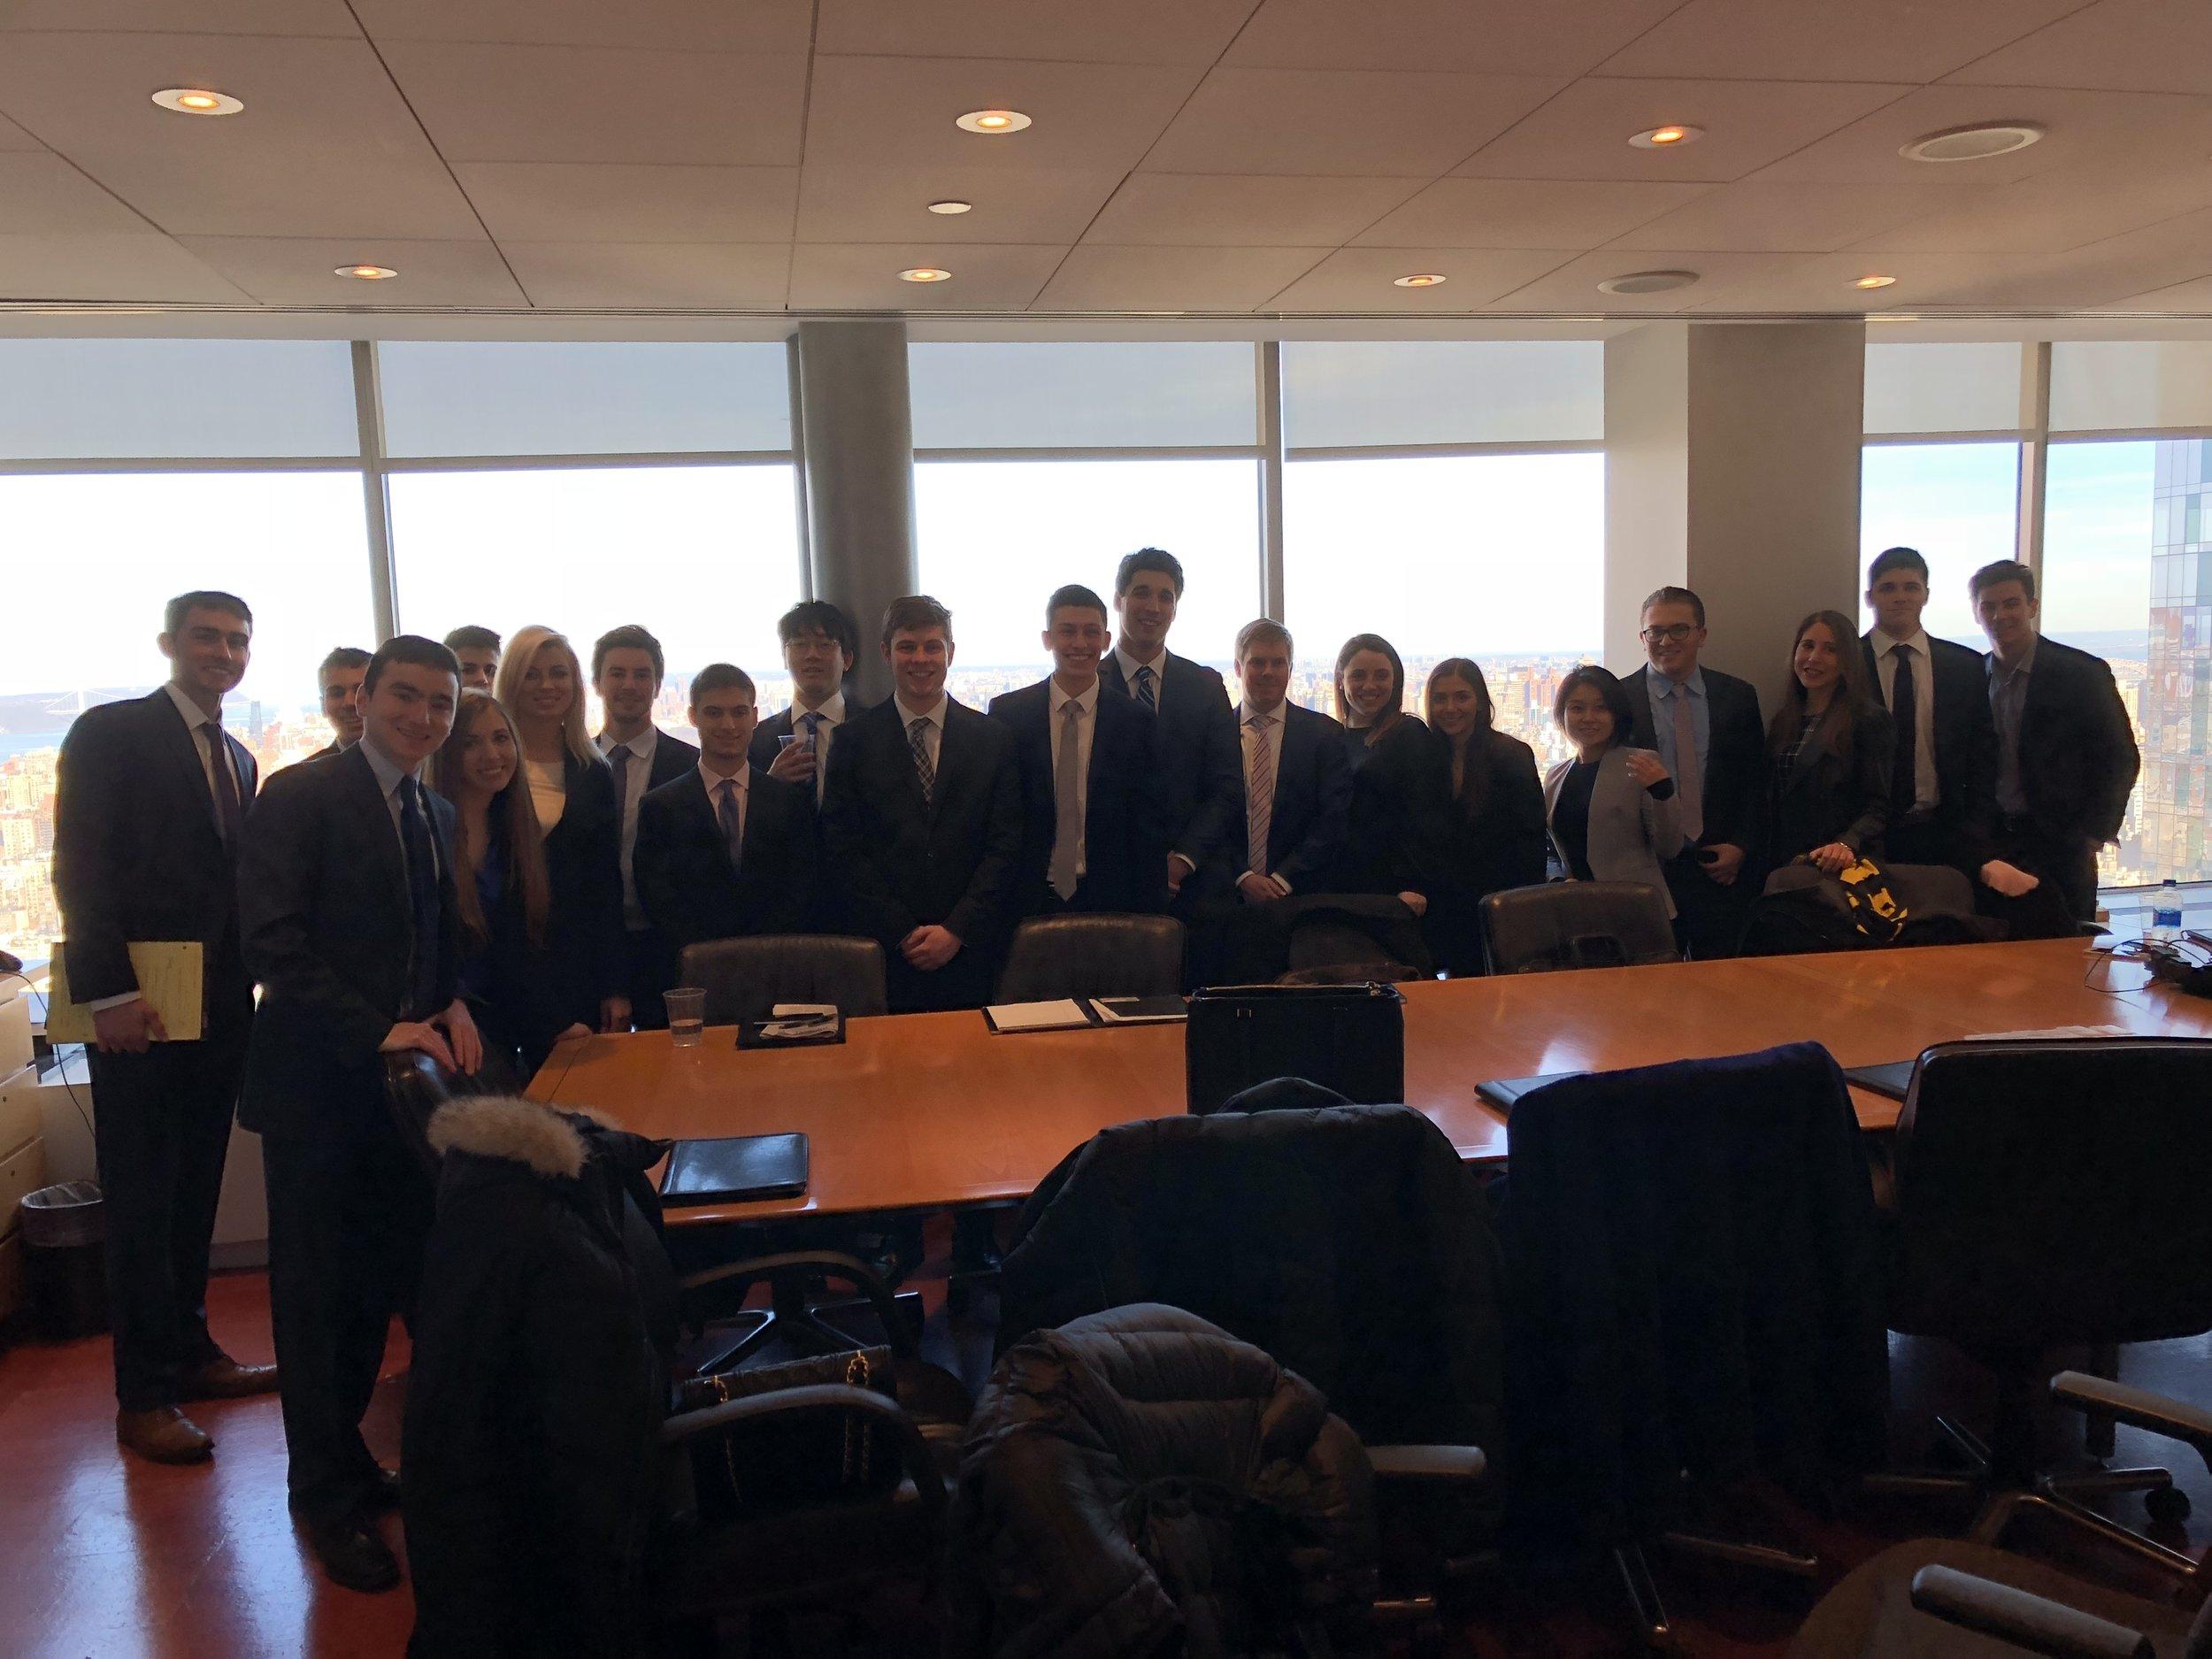 MREC members visit Vornado Realty Trust's NYC headquarters.